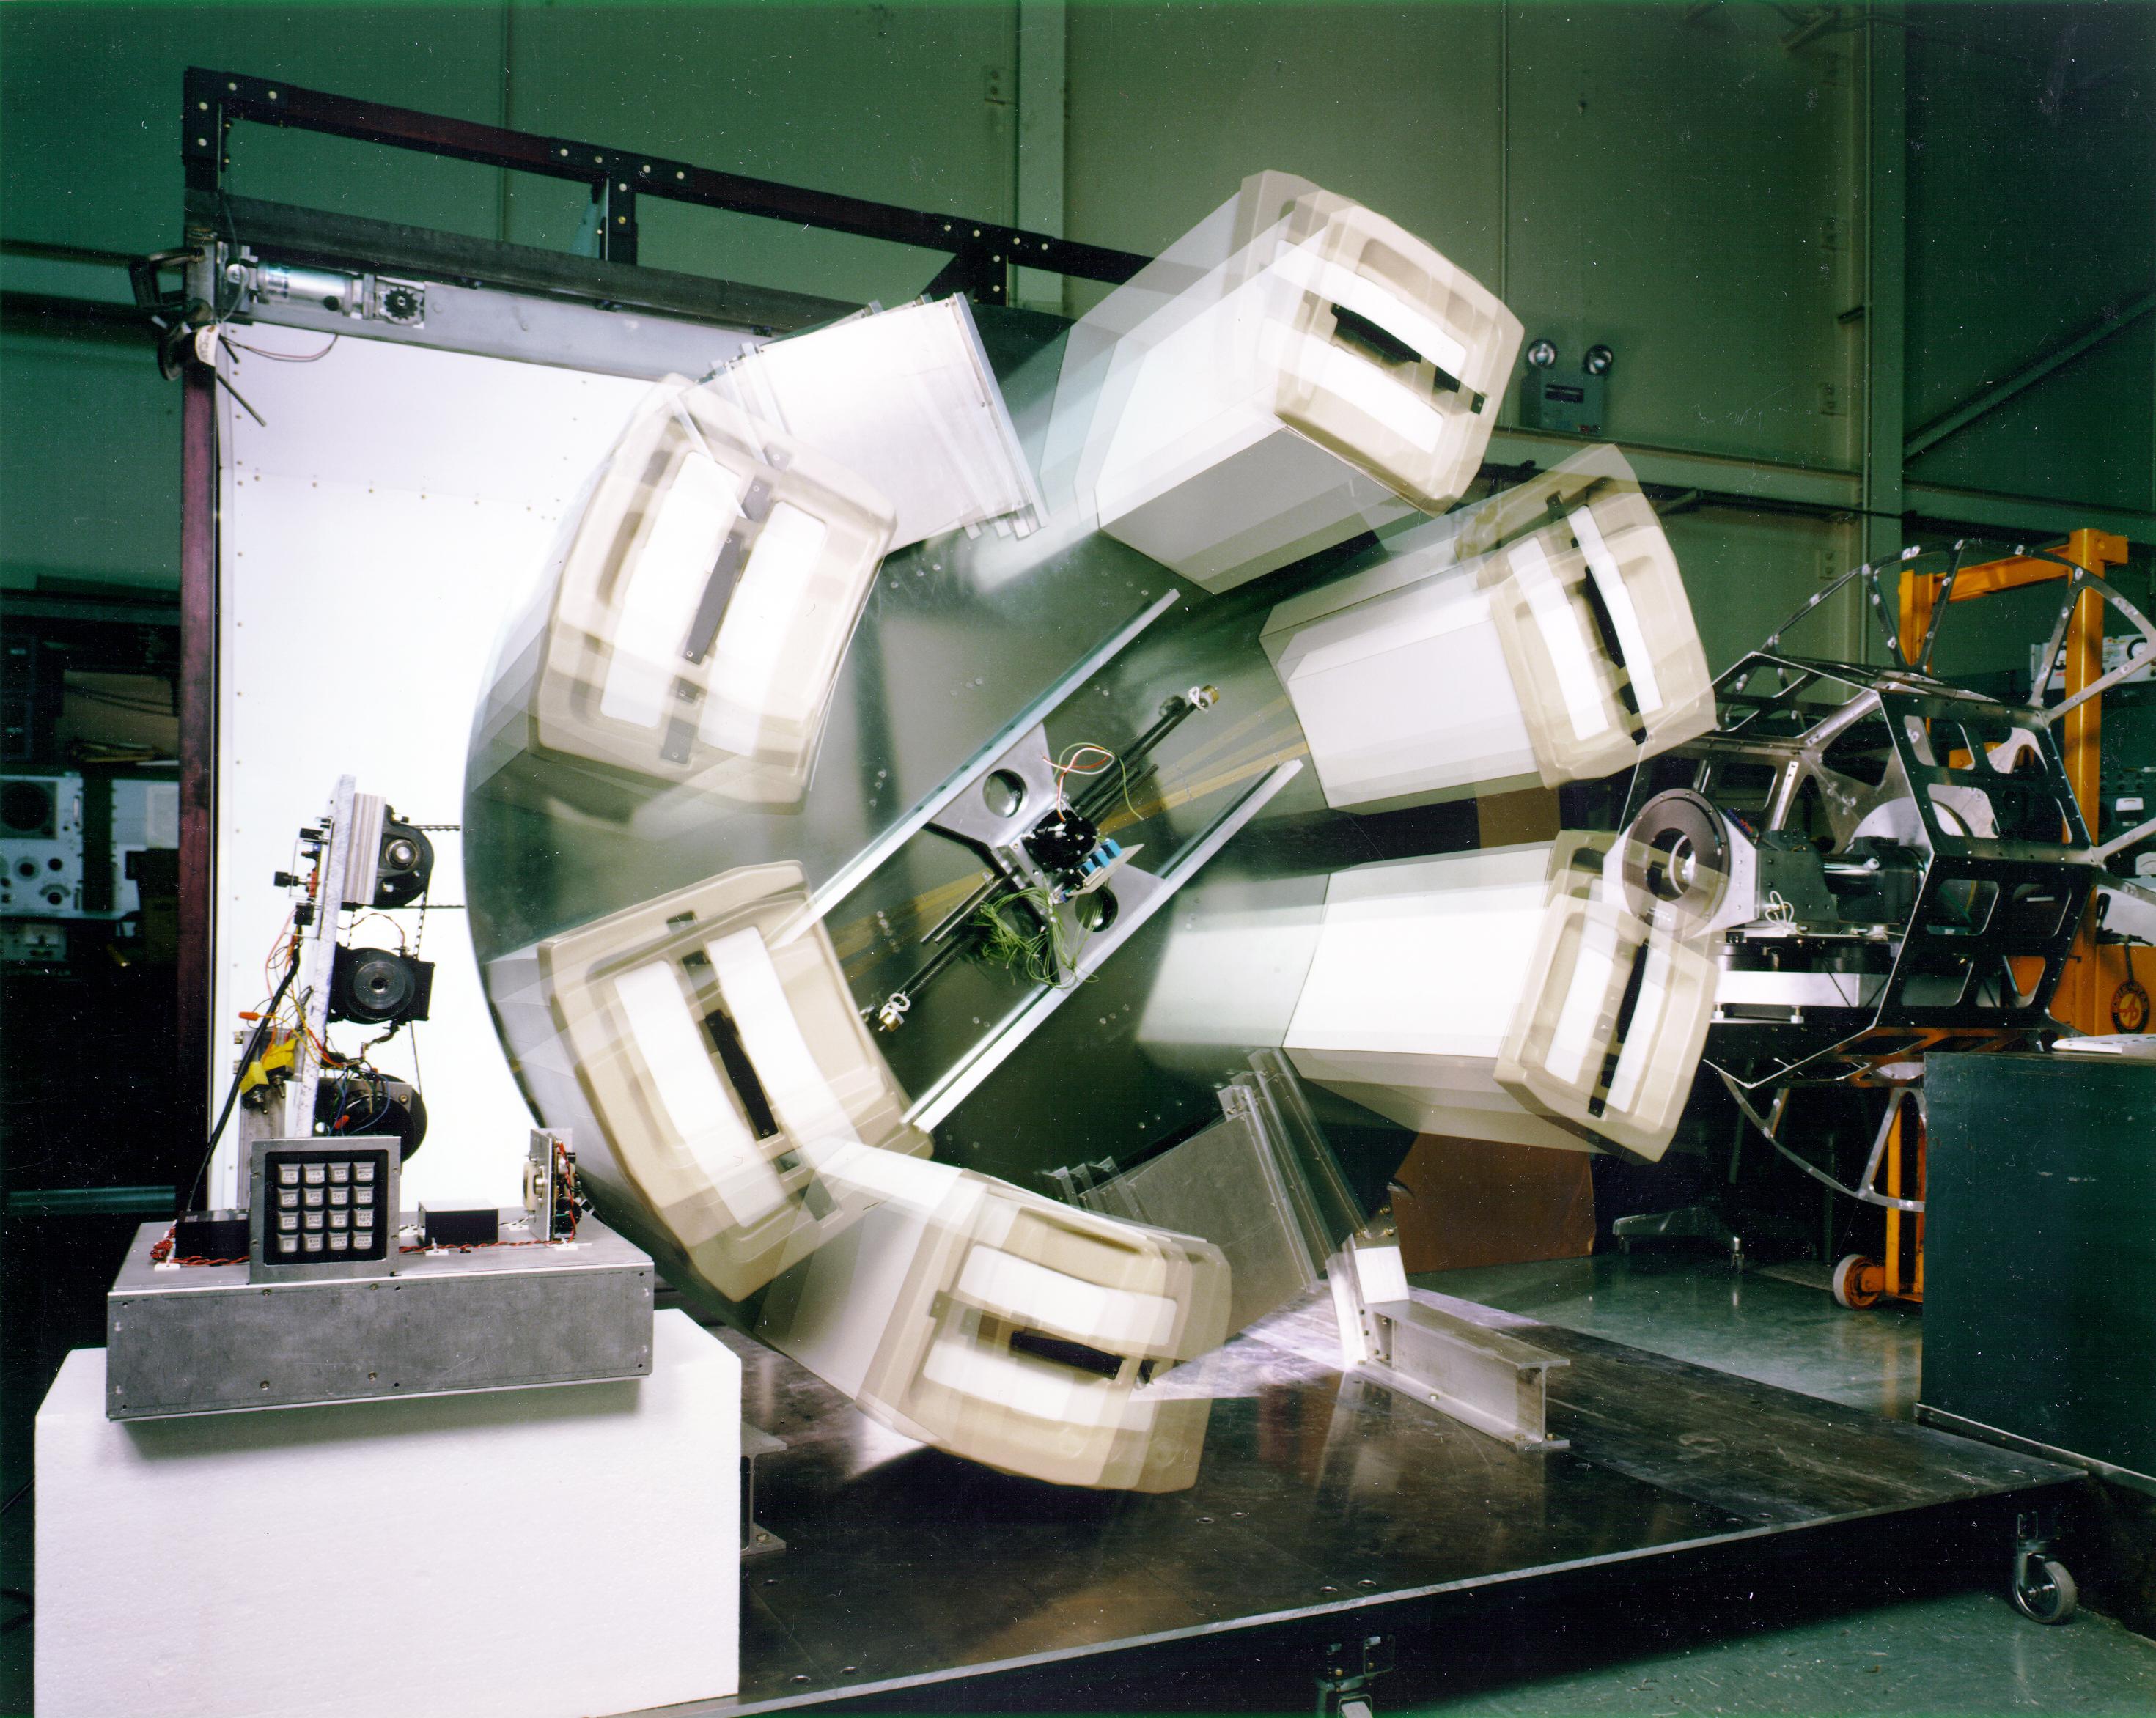 centrifuge nasa - photo #23